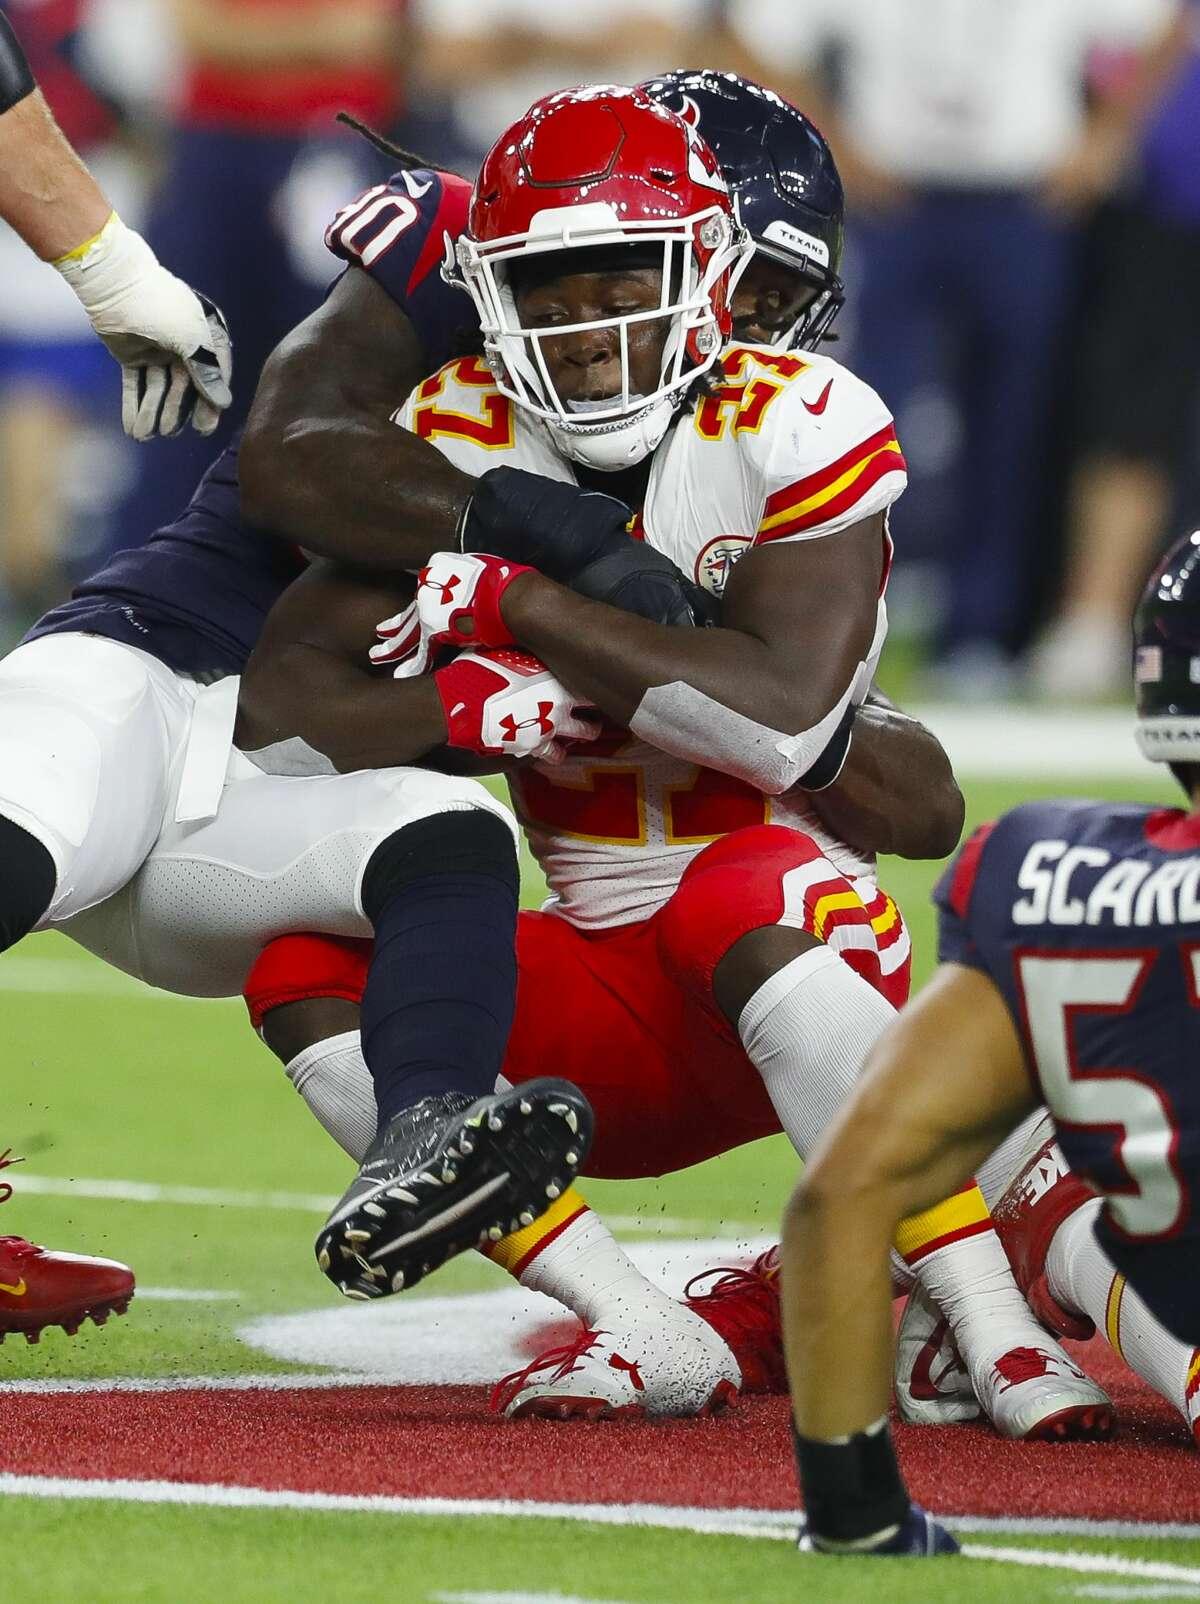 Kansas City Chiefs running back Kareem Hunt (27) is wrapped up by Houston Texans outside linebacker Jadeveon Clowney (90) during the first quarter of an NFL football game at NRG Stadium on Sunday, Oct. 8, 2017, in Houston. ( Brett Coomer / Houston Chronicle )